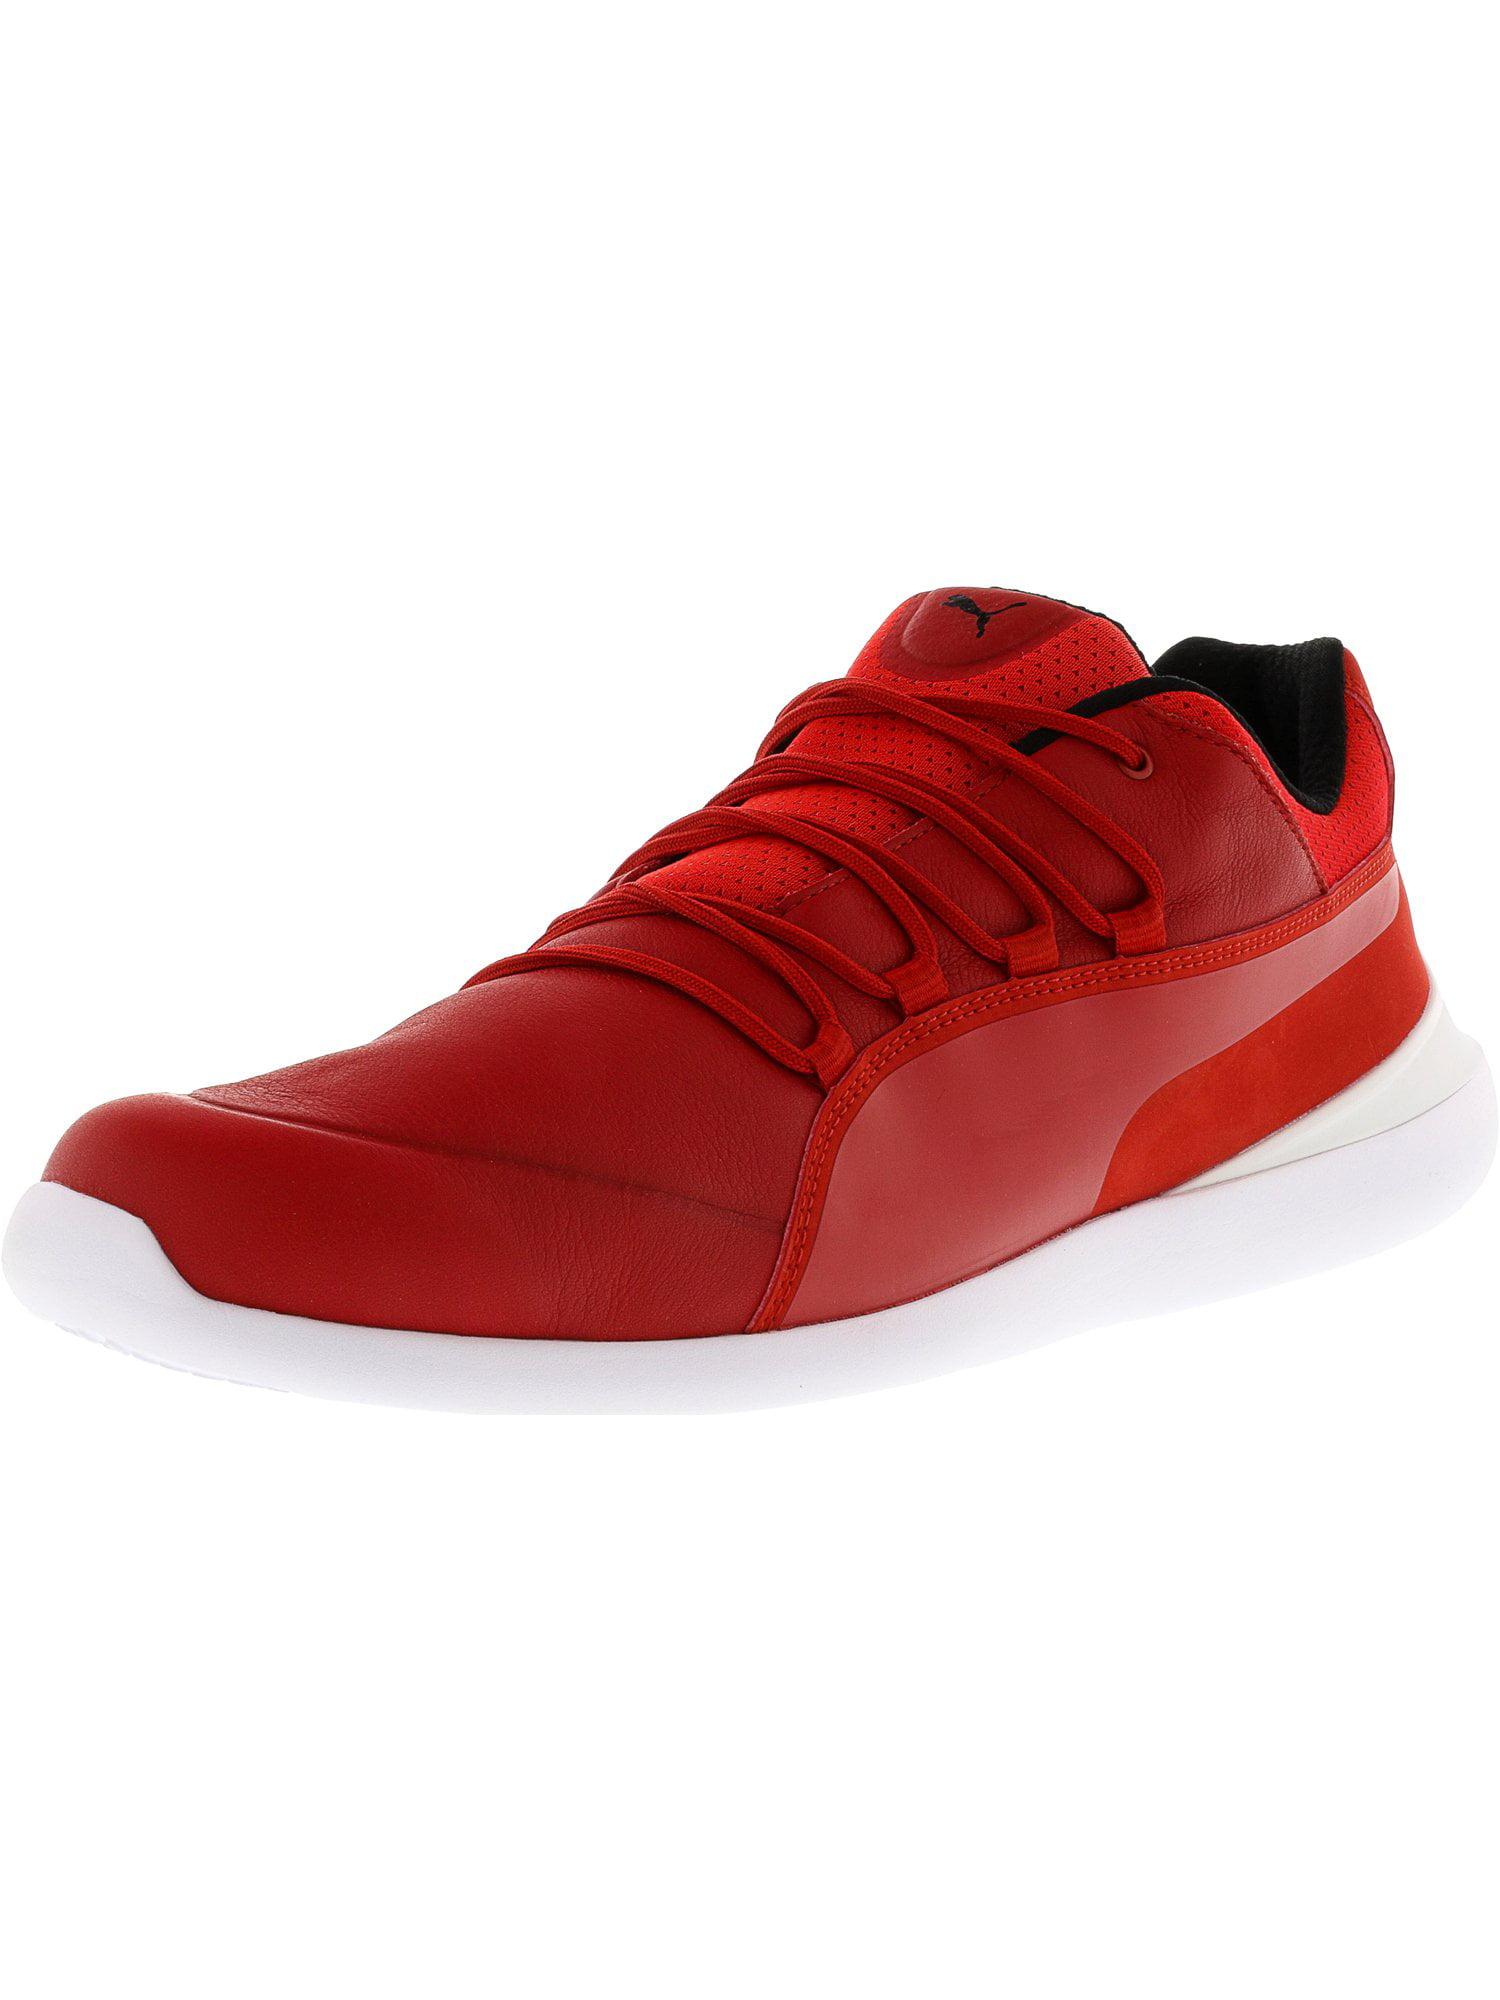 Puma Men's Ferrari Evo Cat Rosso Corsa / White Ankle-High Fashion Sneaker - 11M